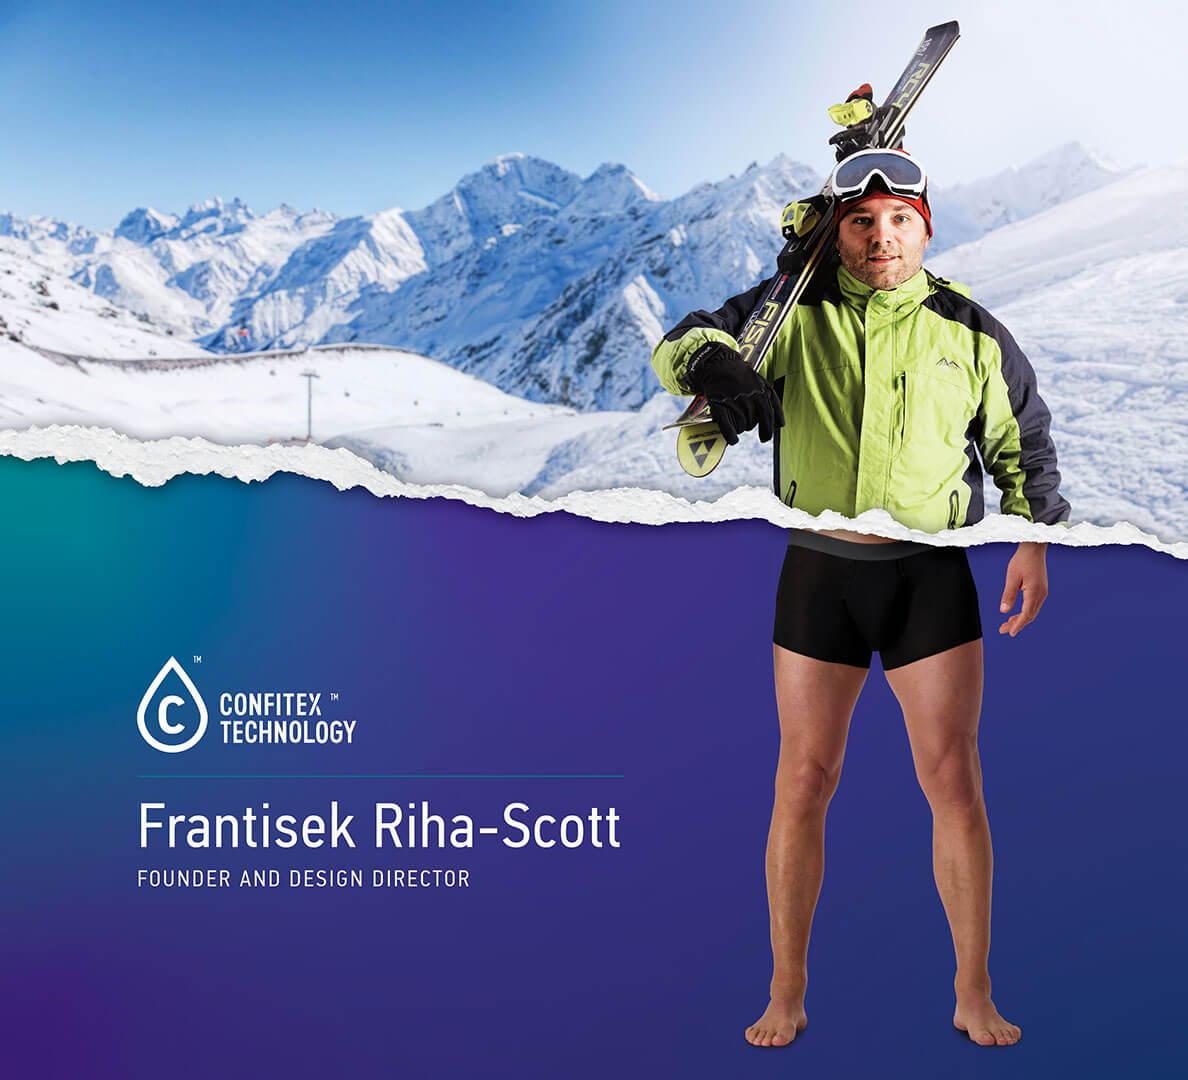 Frantisek Riha-Scott - Confitex founder and Design Director